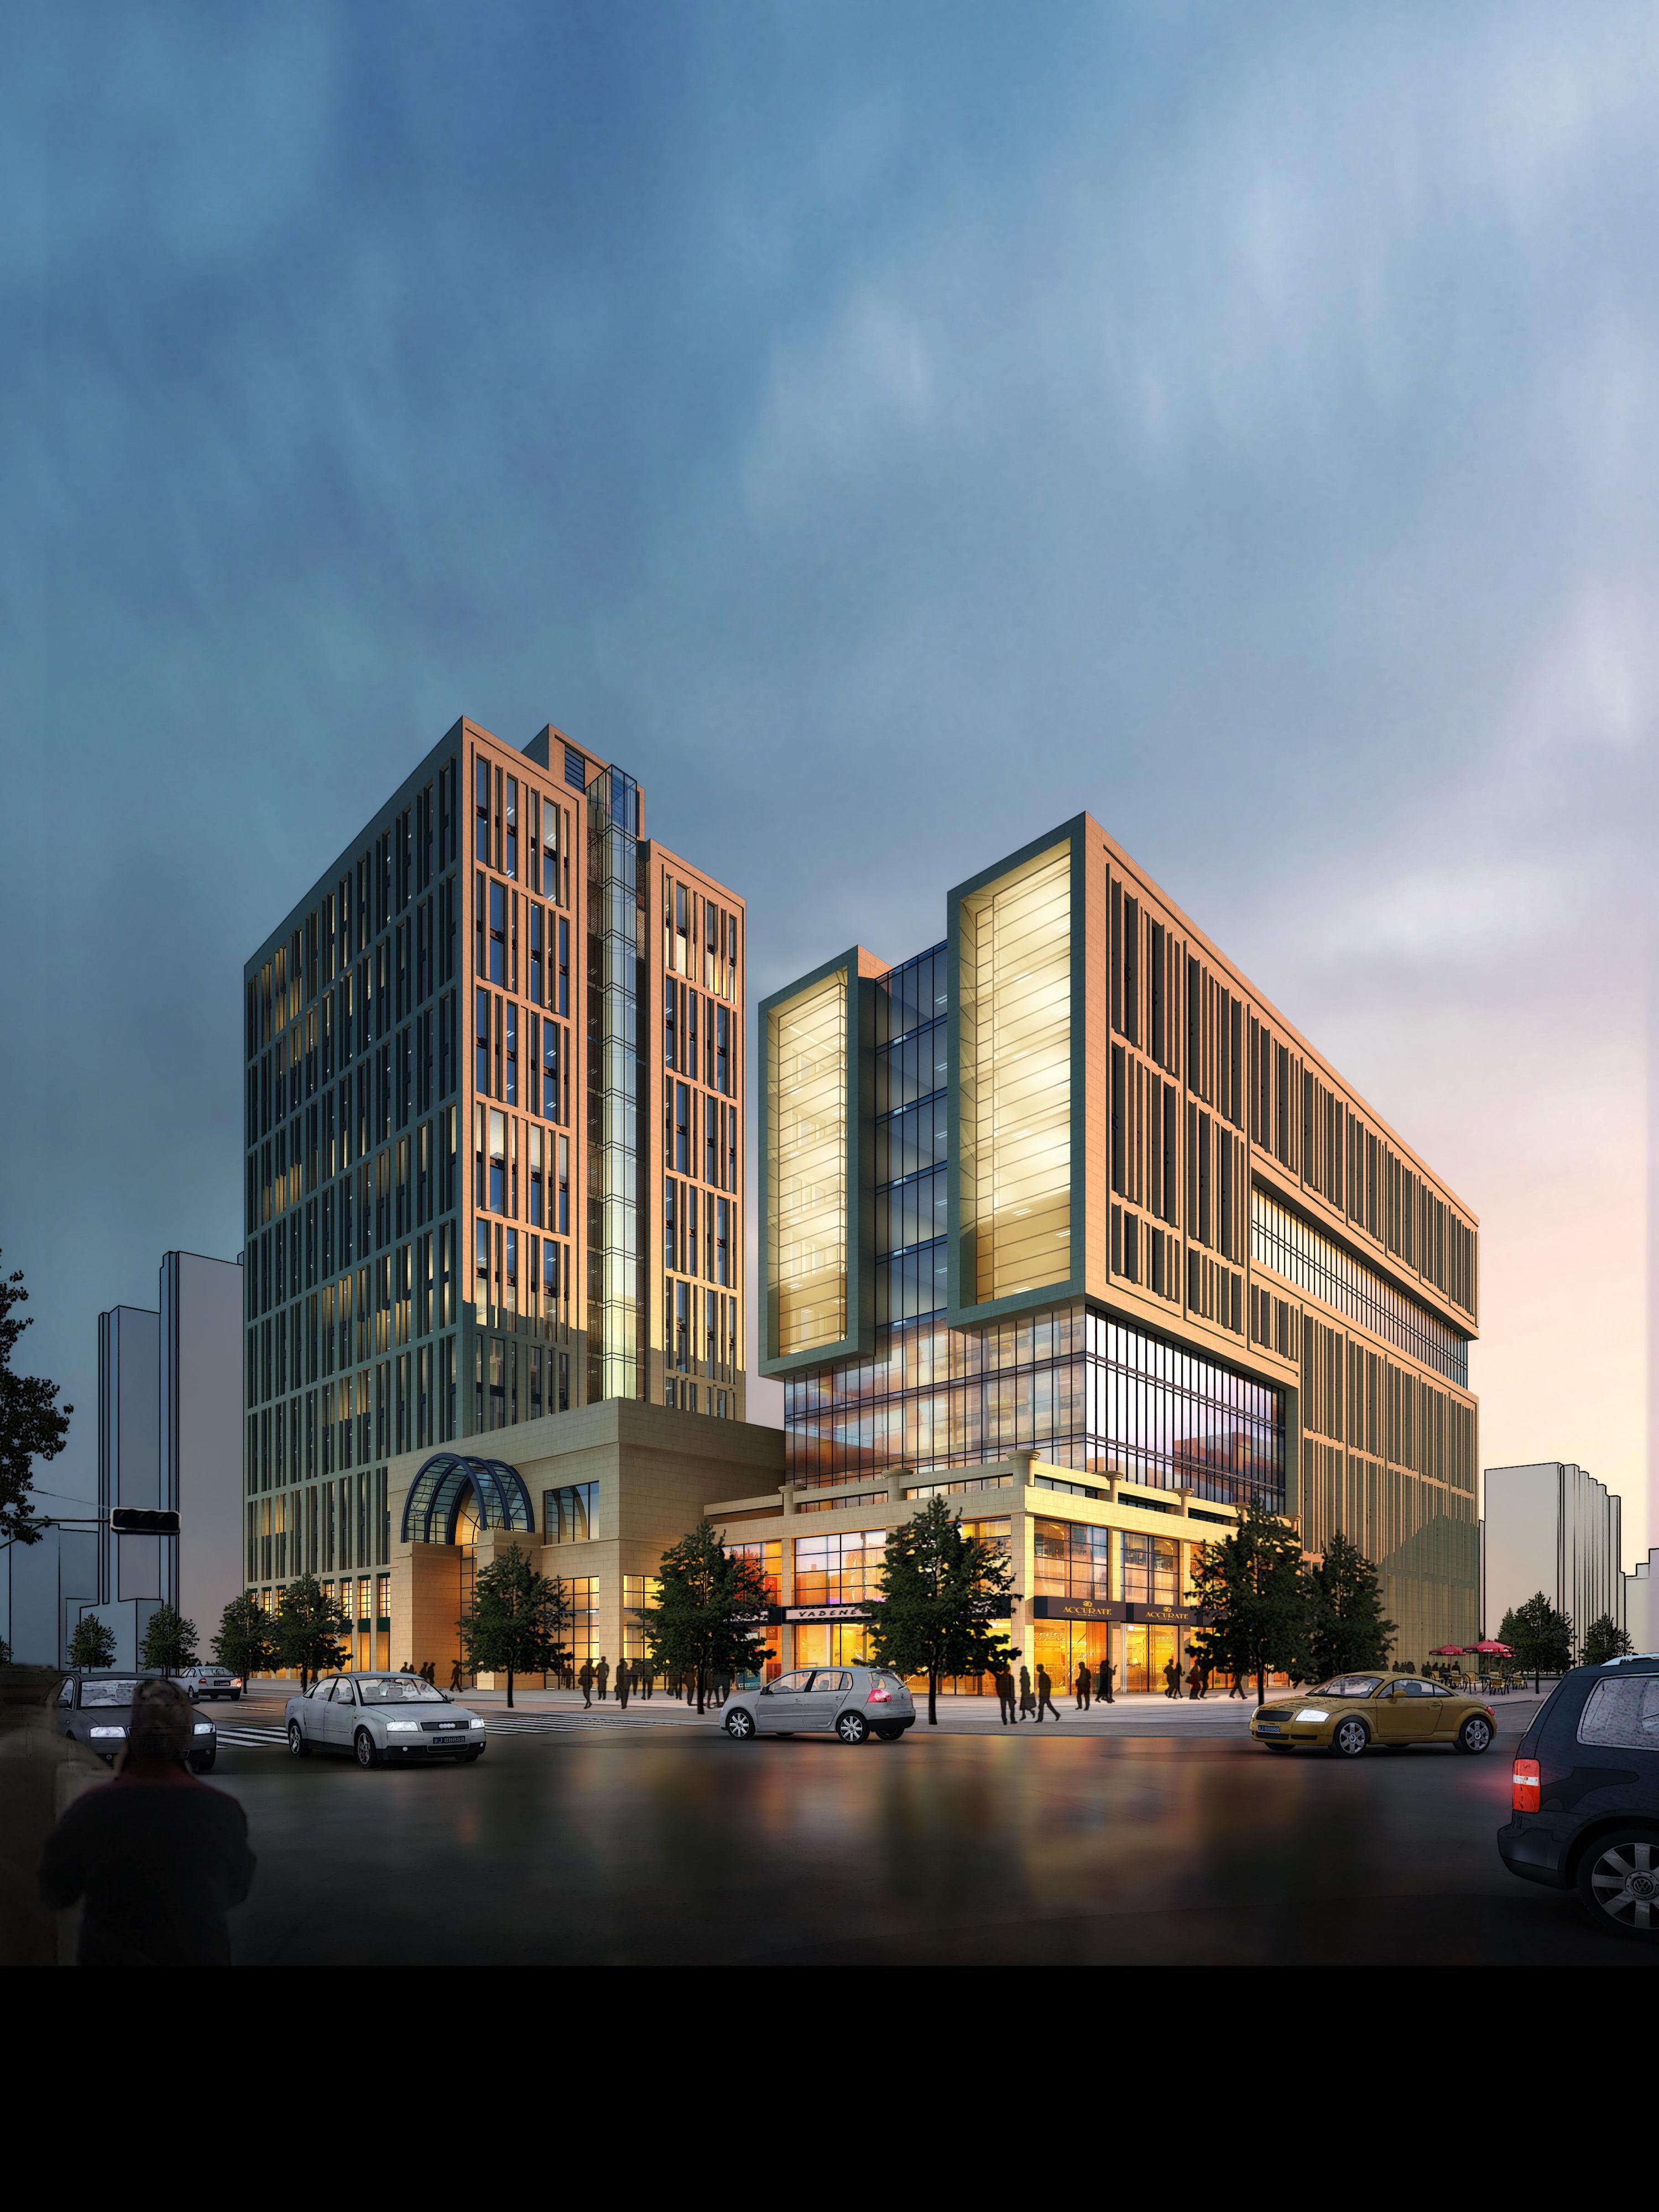 City park hotel office building design 21 3d model for Designhotel 21